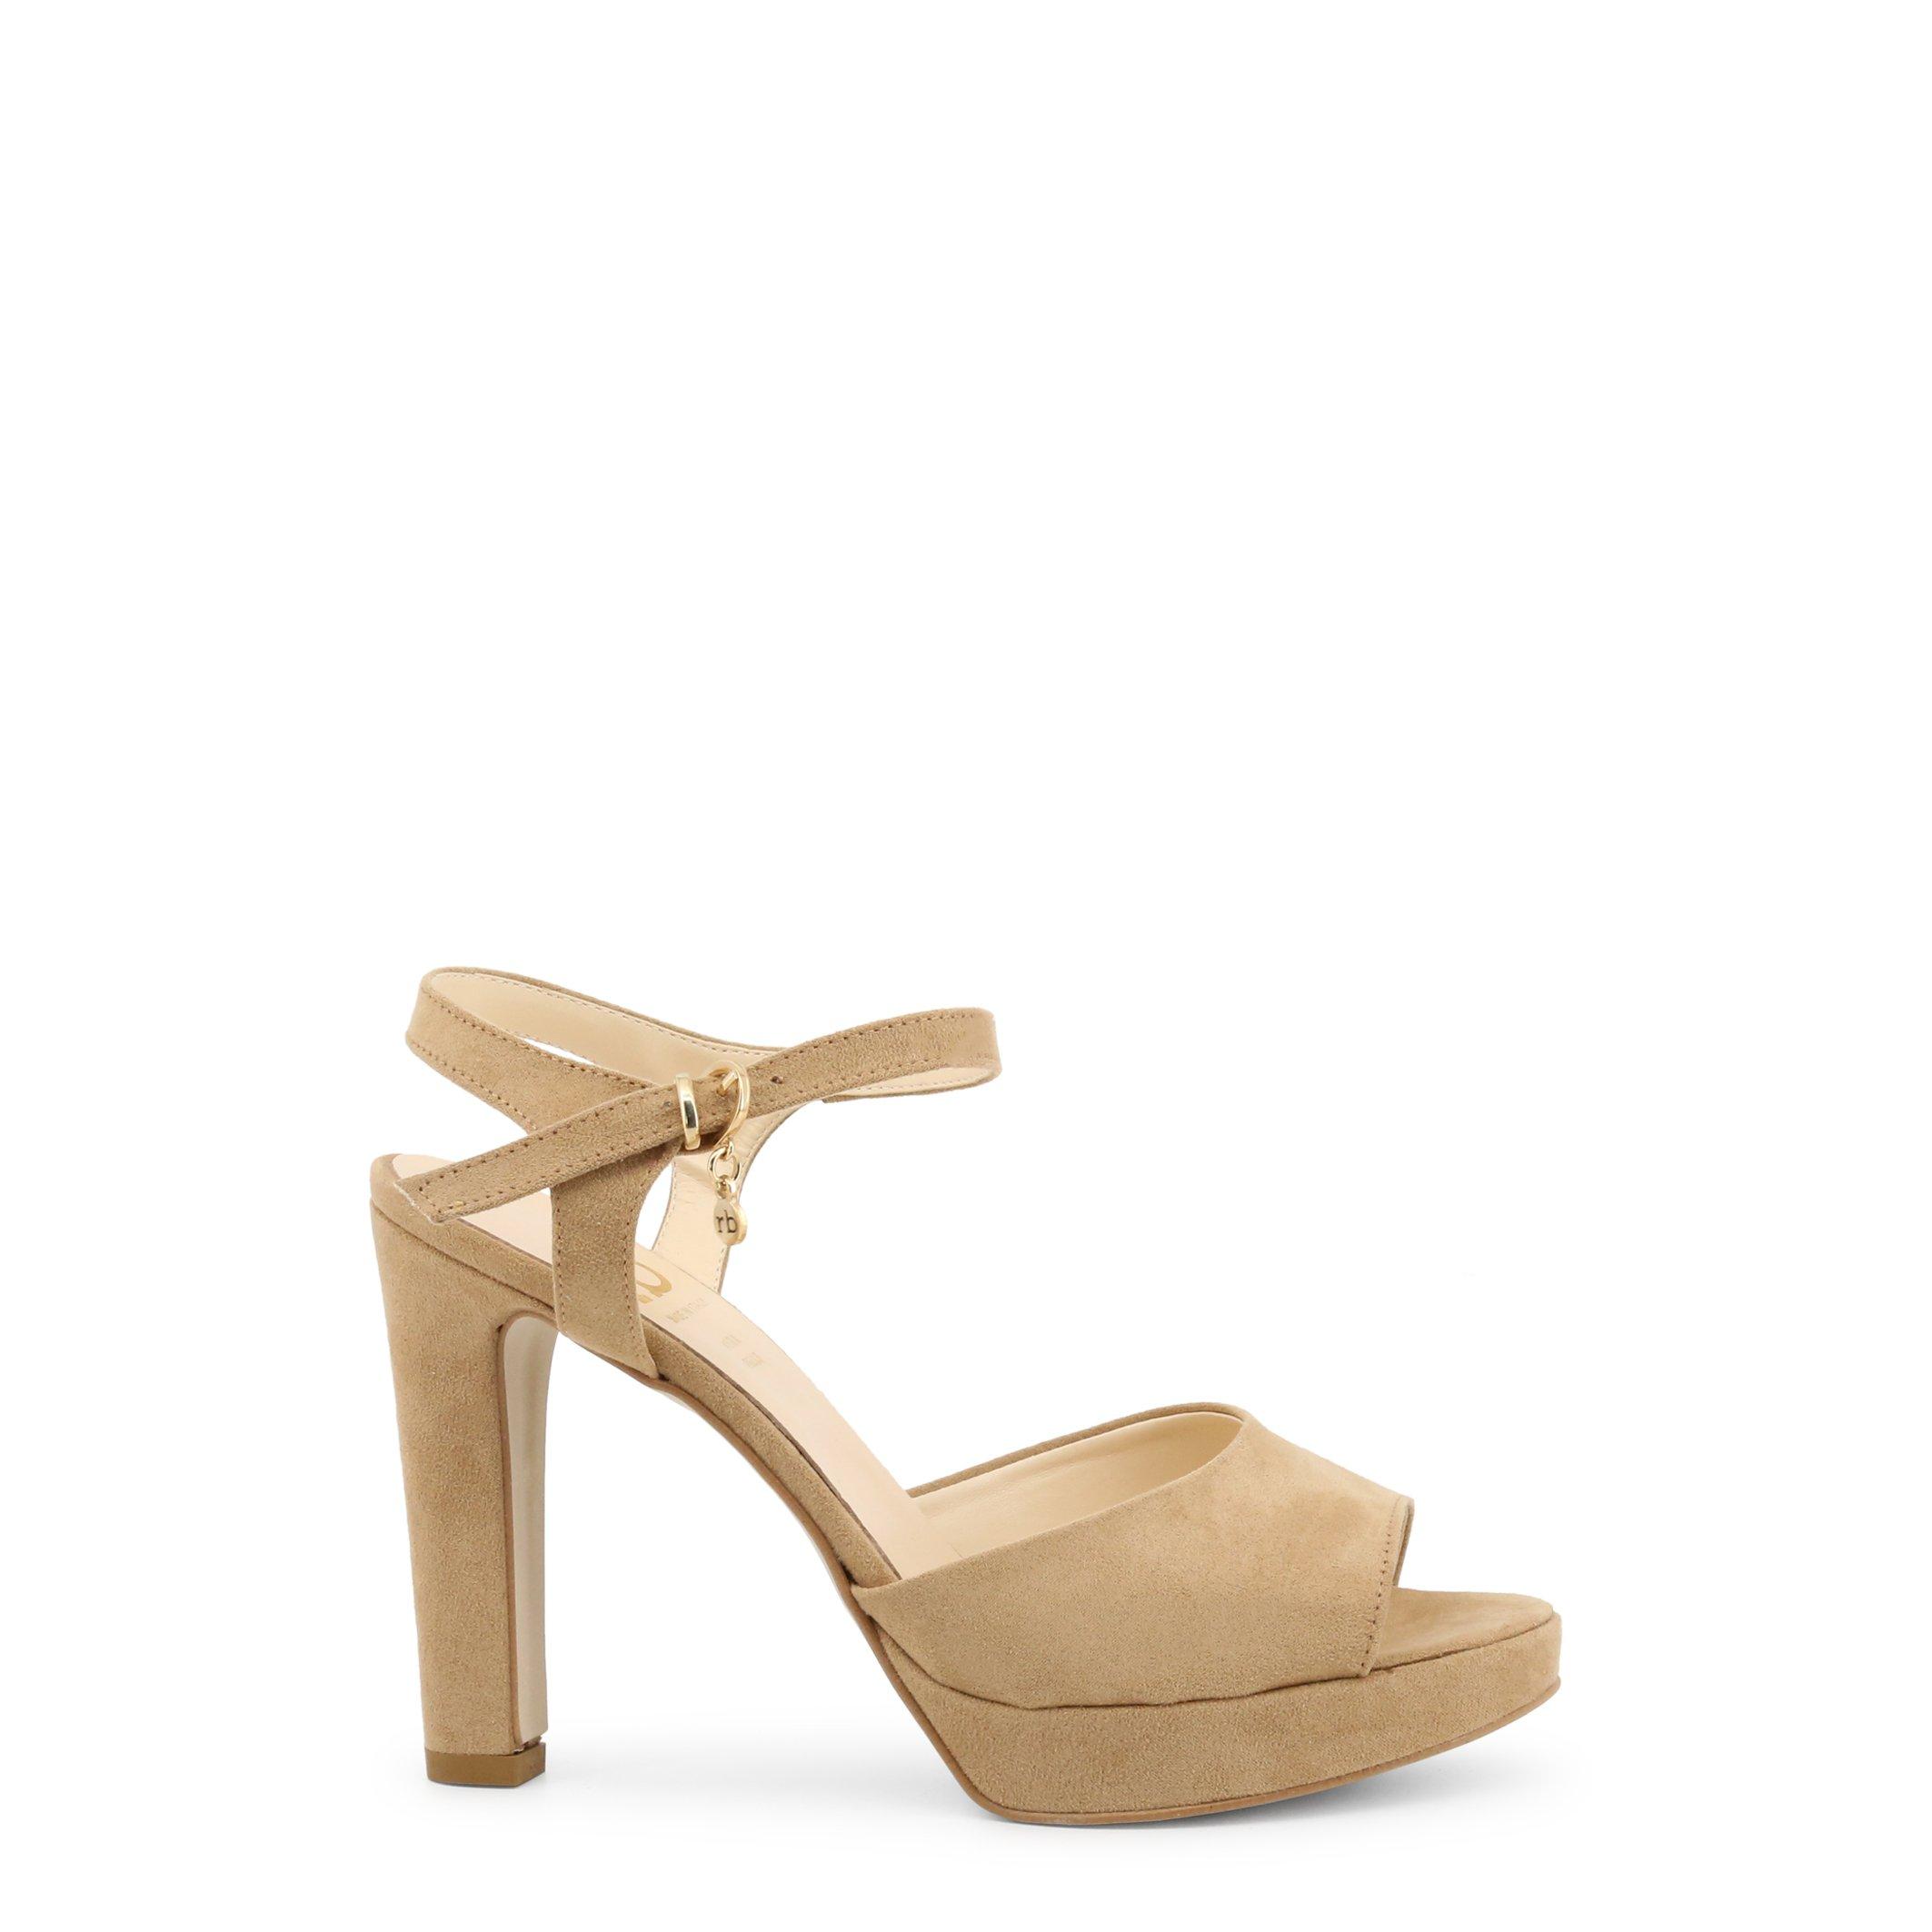 Roccobarocco Women's Sandal Various Colours RBSC05V11 - brown EU 39